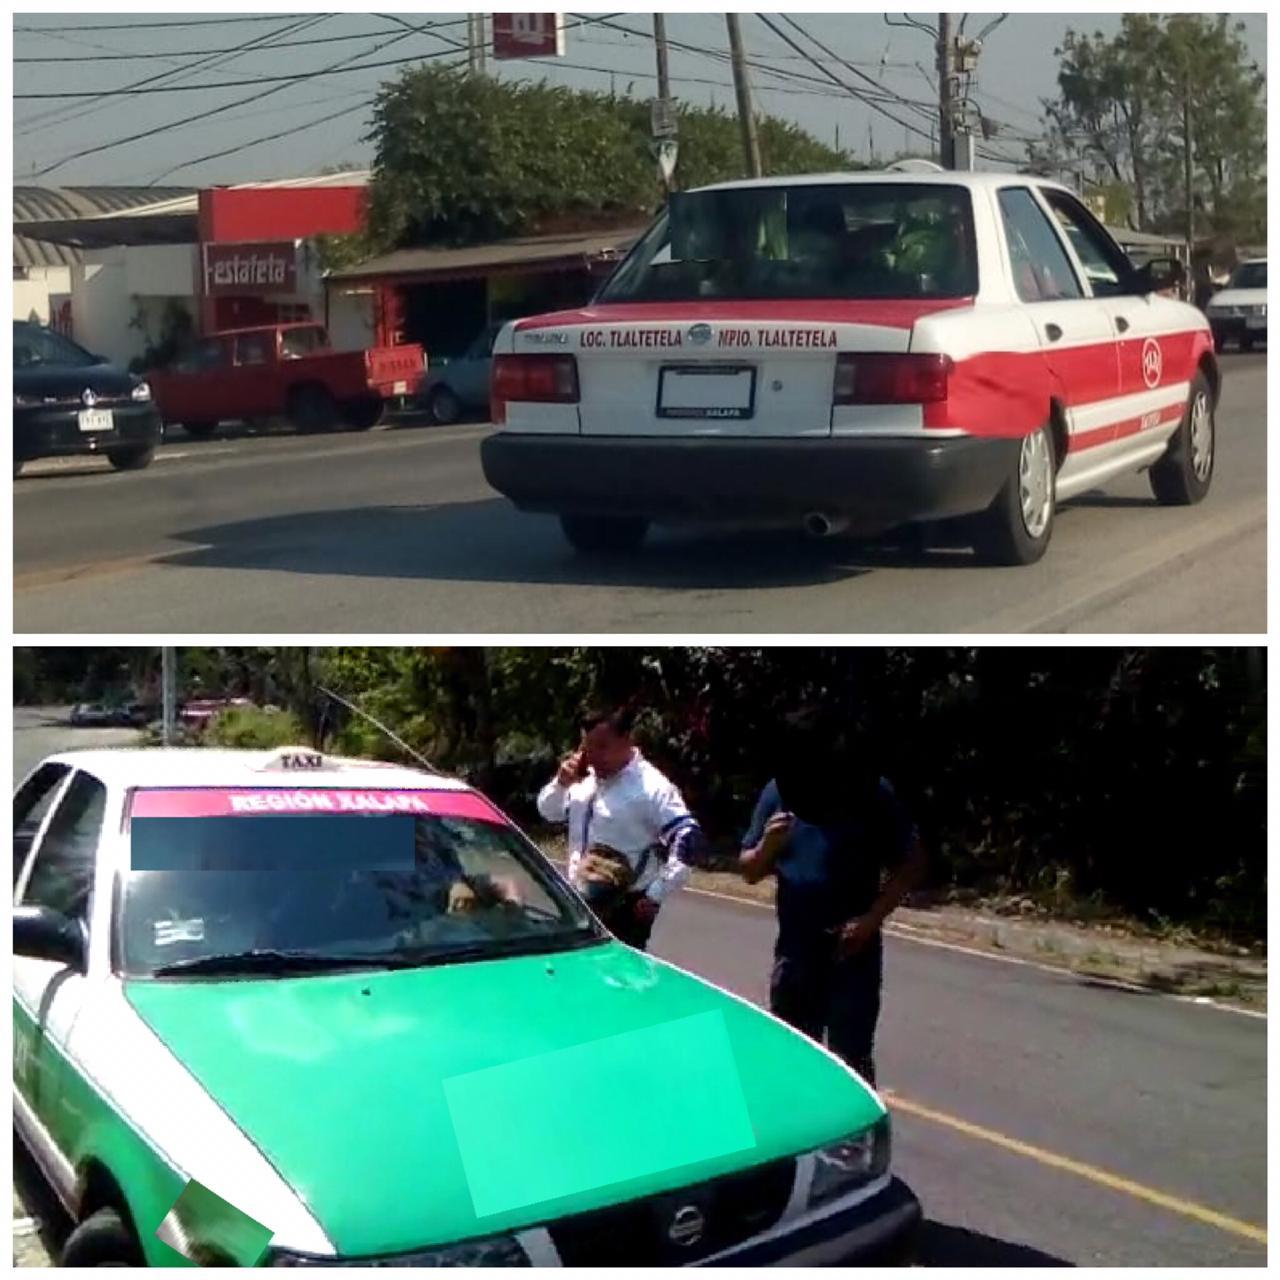 Acusan a alcalde de Tlaltetela de adueñarse de taxis colectivos